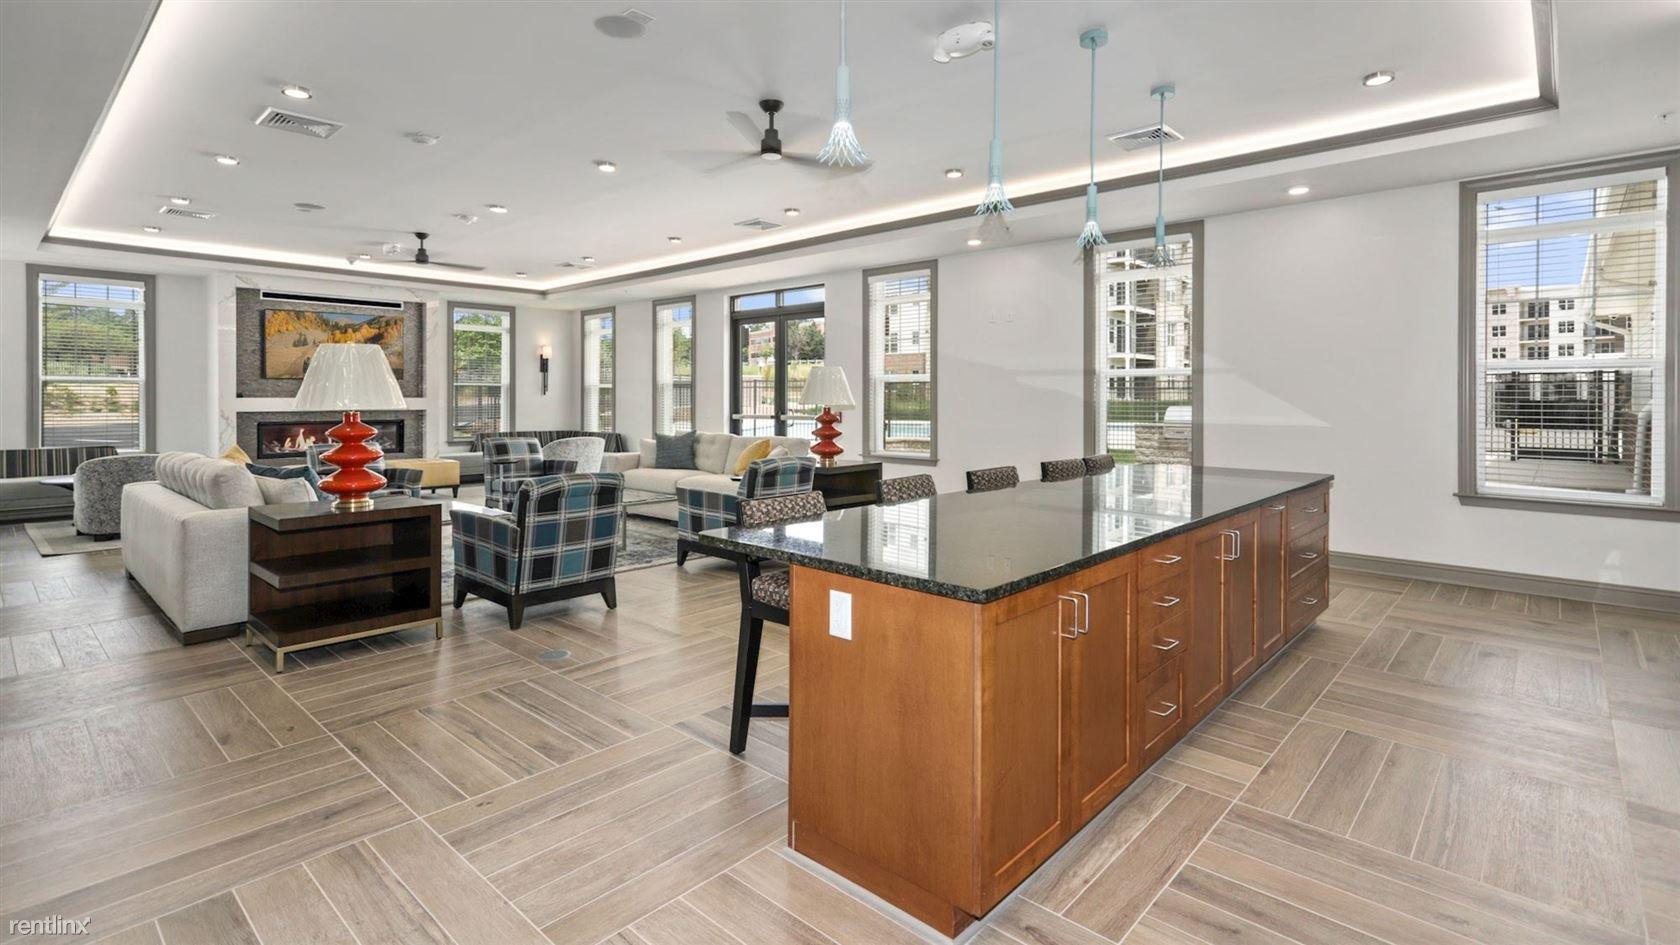 Apartment for Rent in White Marsh